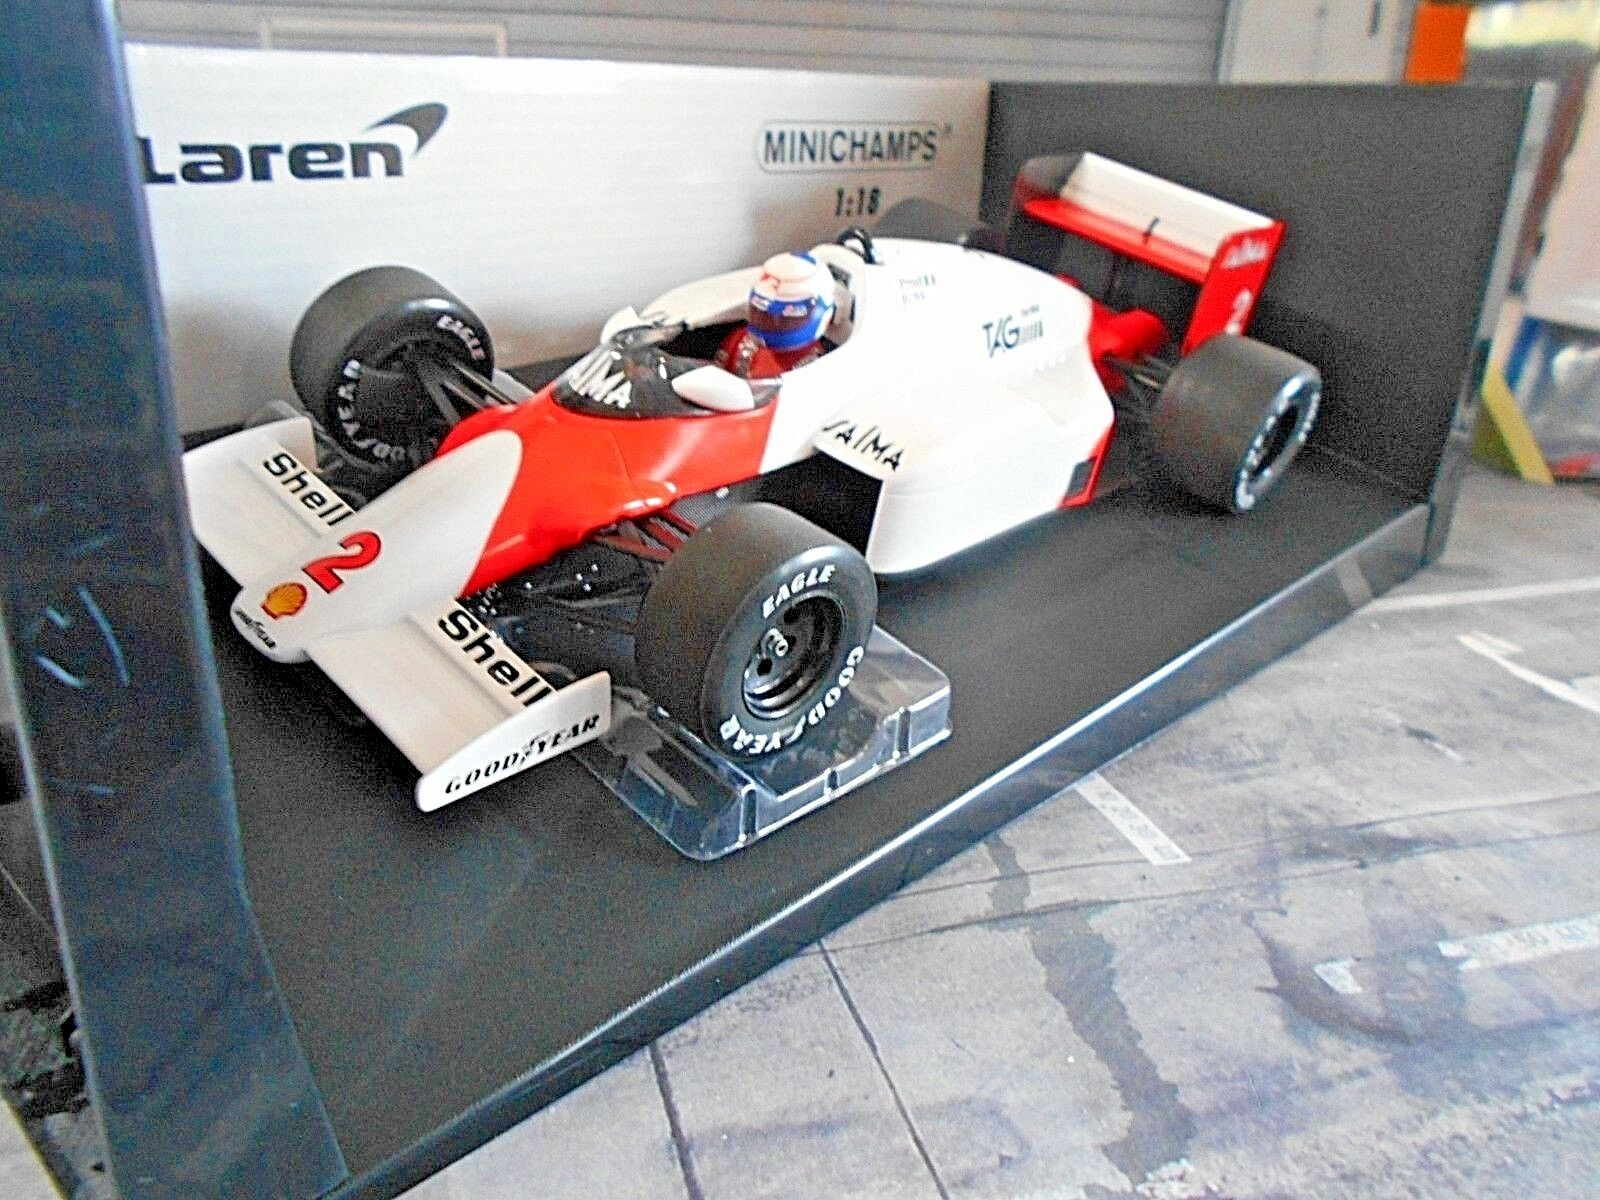 F1 McLaren Porsche mp4 2b mp4 Tag 1985 Cheers + decals Minichamps MARLBOR 1 18